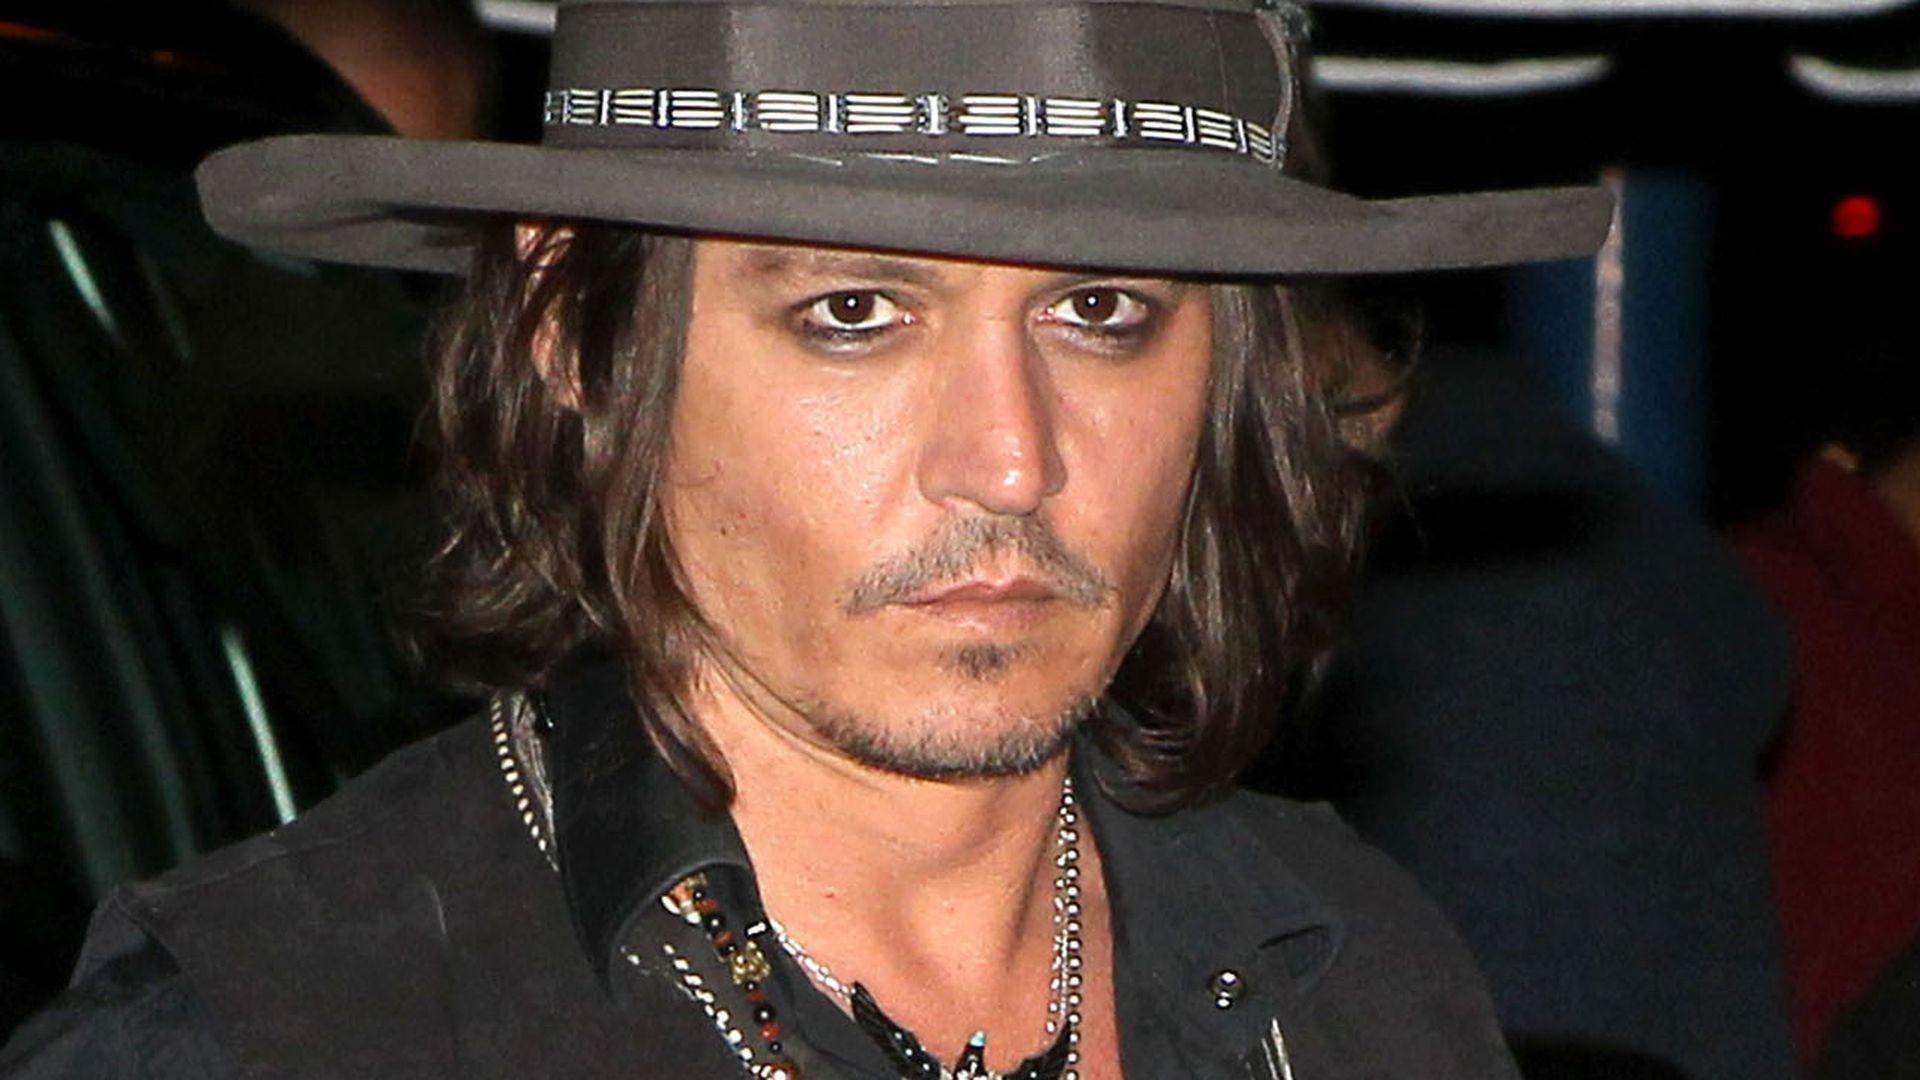 Johnny Depp: Unter 20 Millionen geht nichts! | Promiflash.de Johnny Depp/newspaper Articles